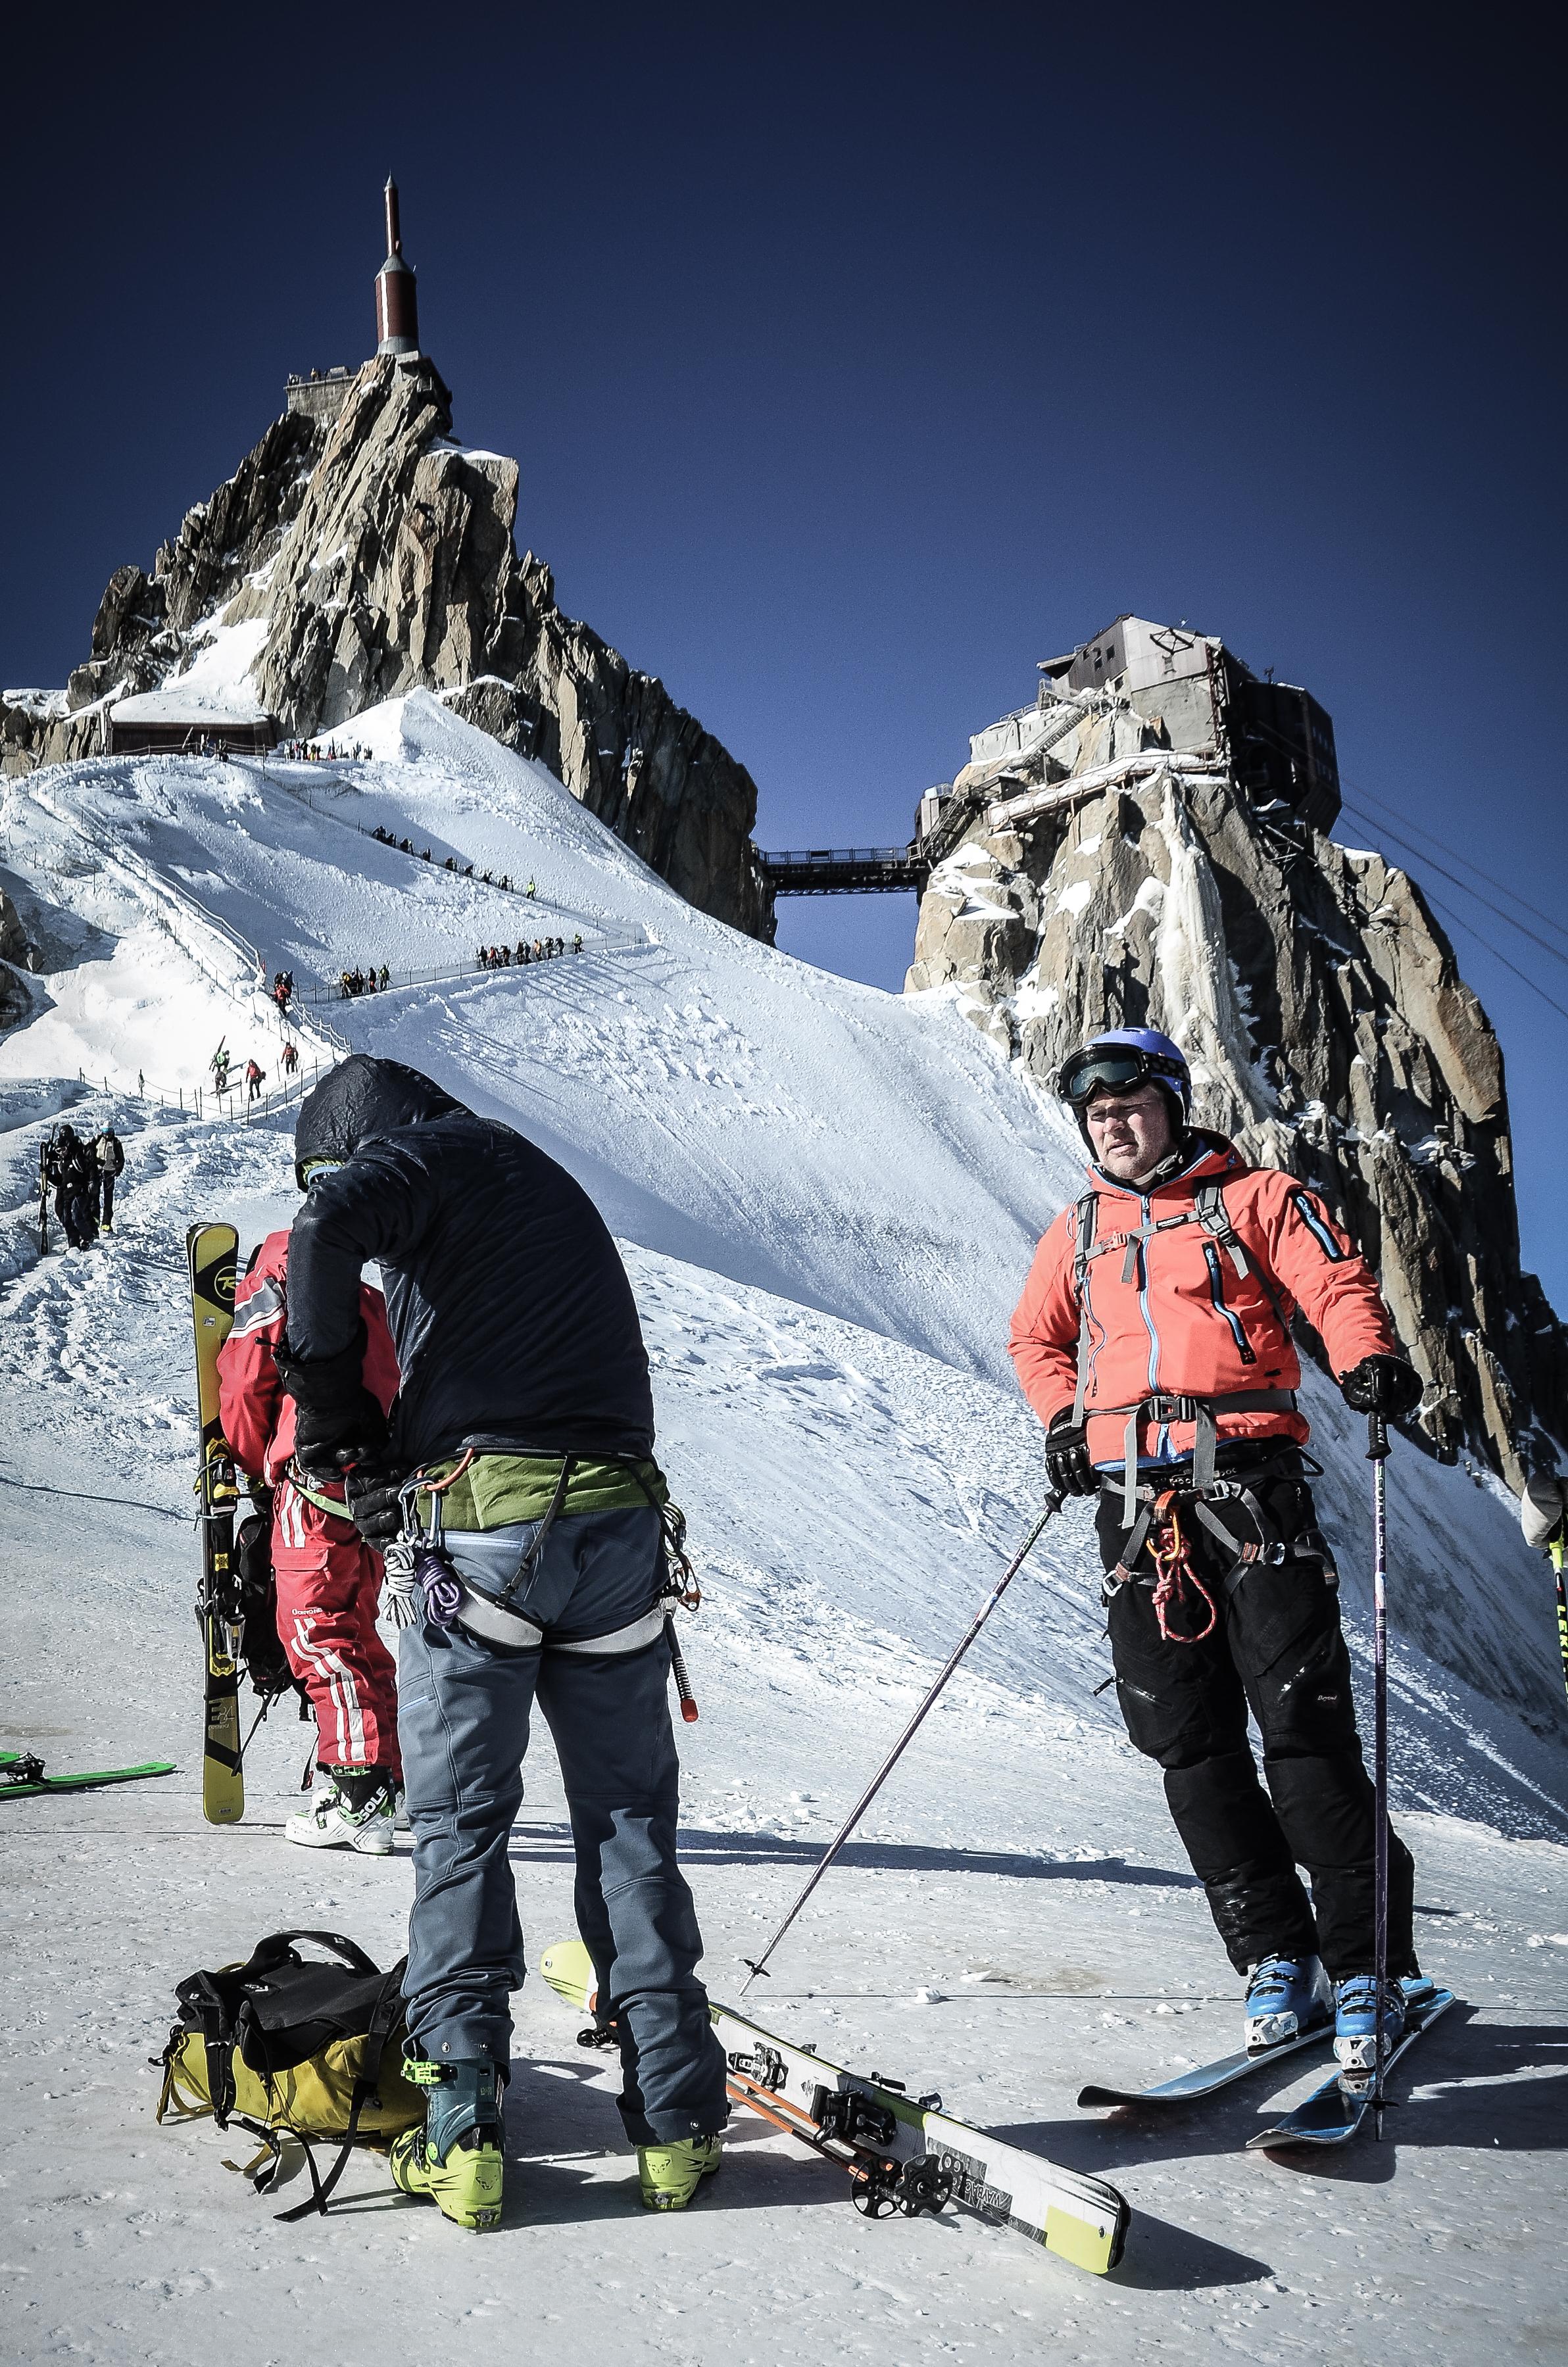 Ferried skiing week Chamonix